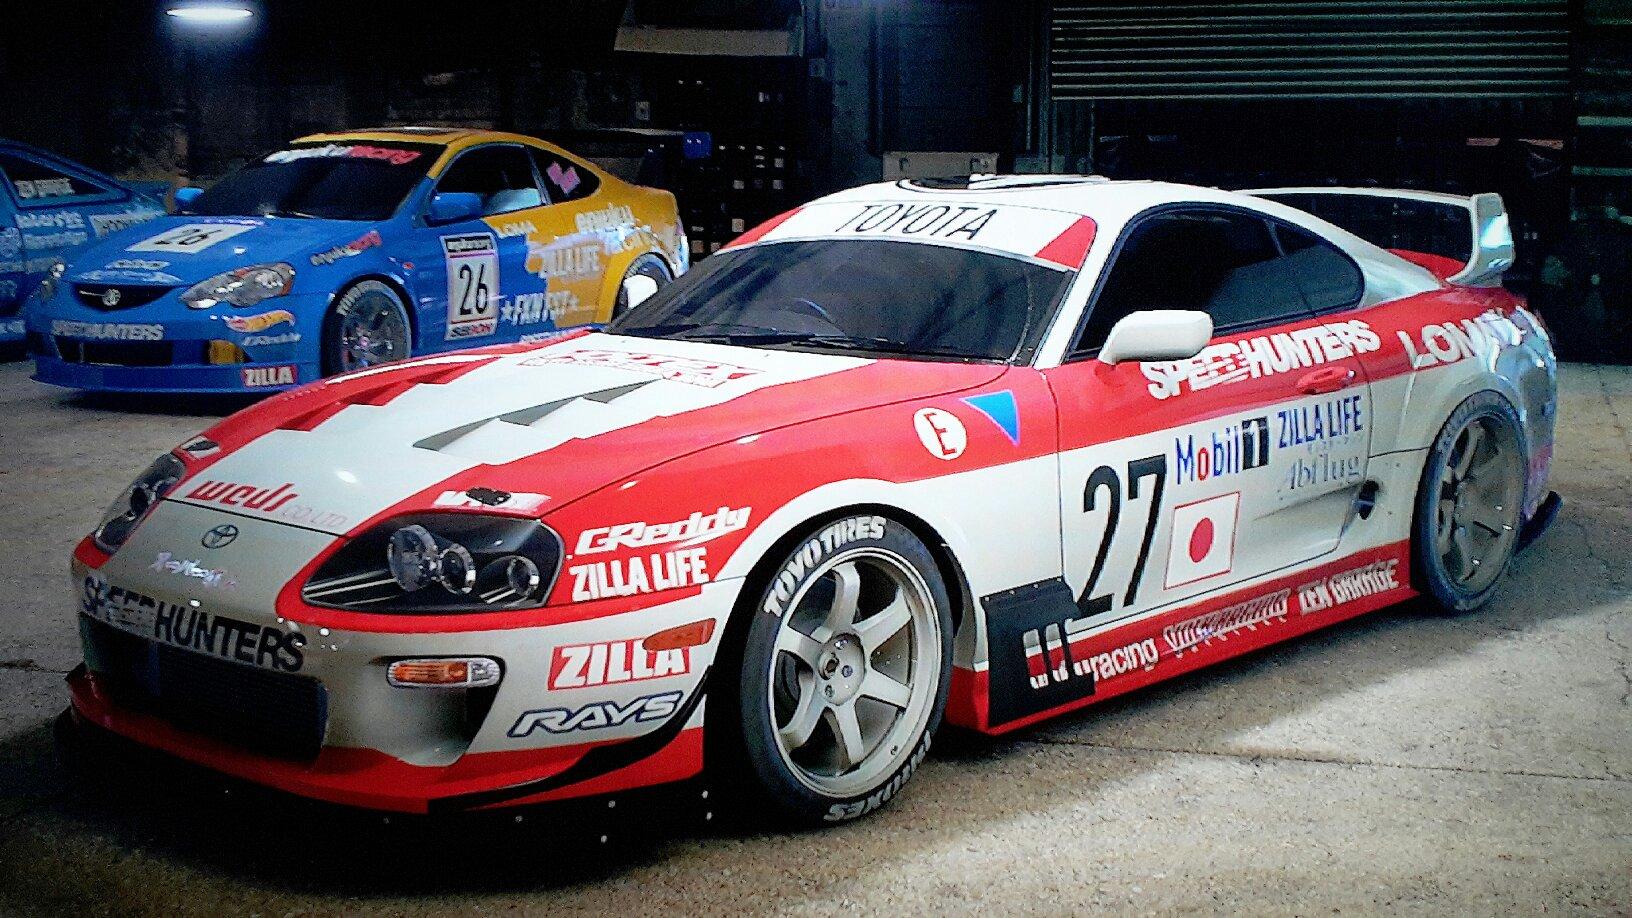 Toyota Race Cars >> Toyota Supra Race Car Nfs 2k15